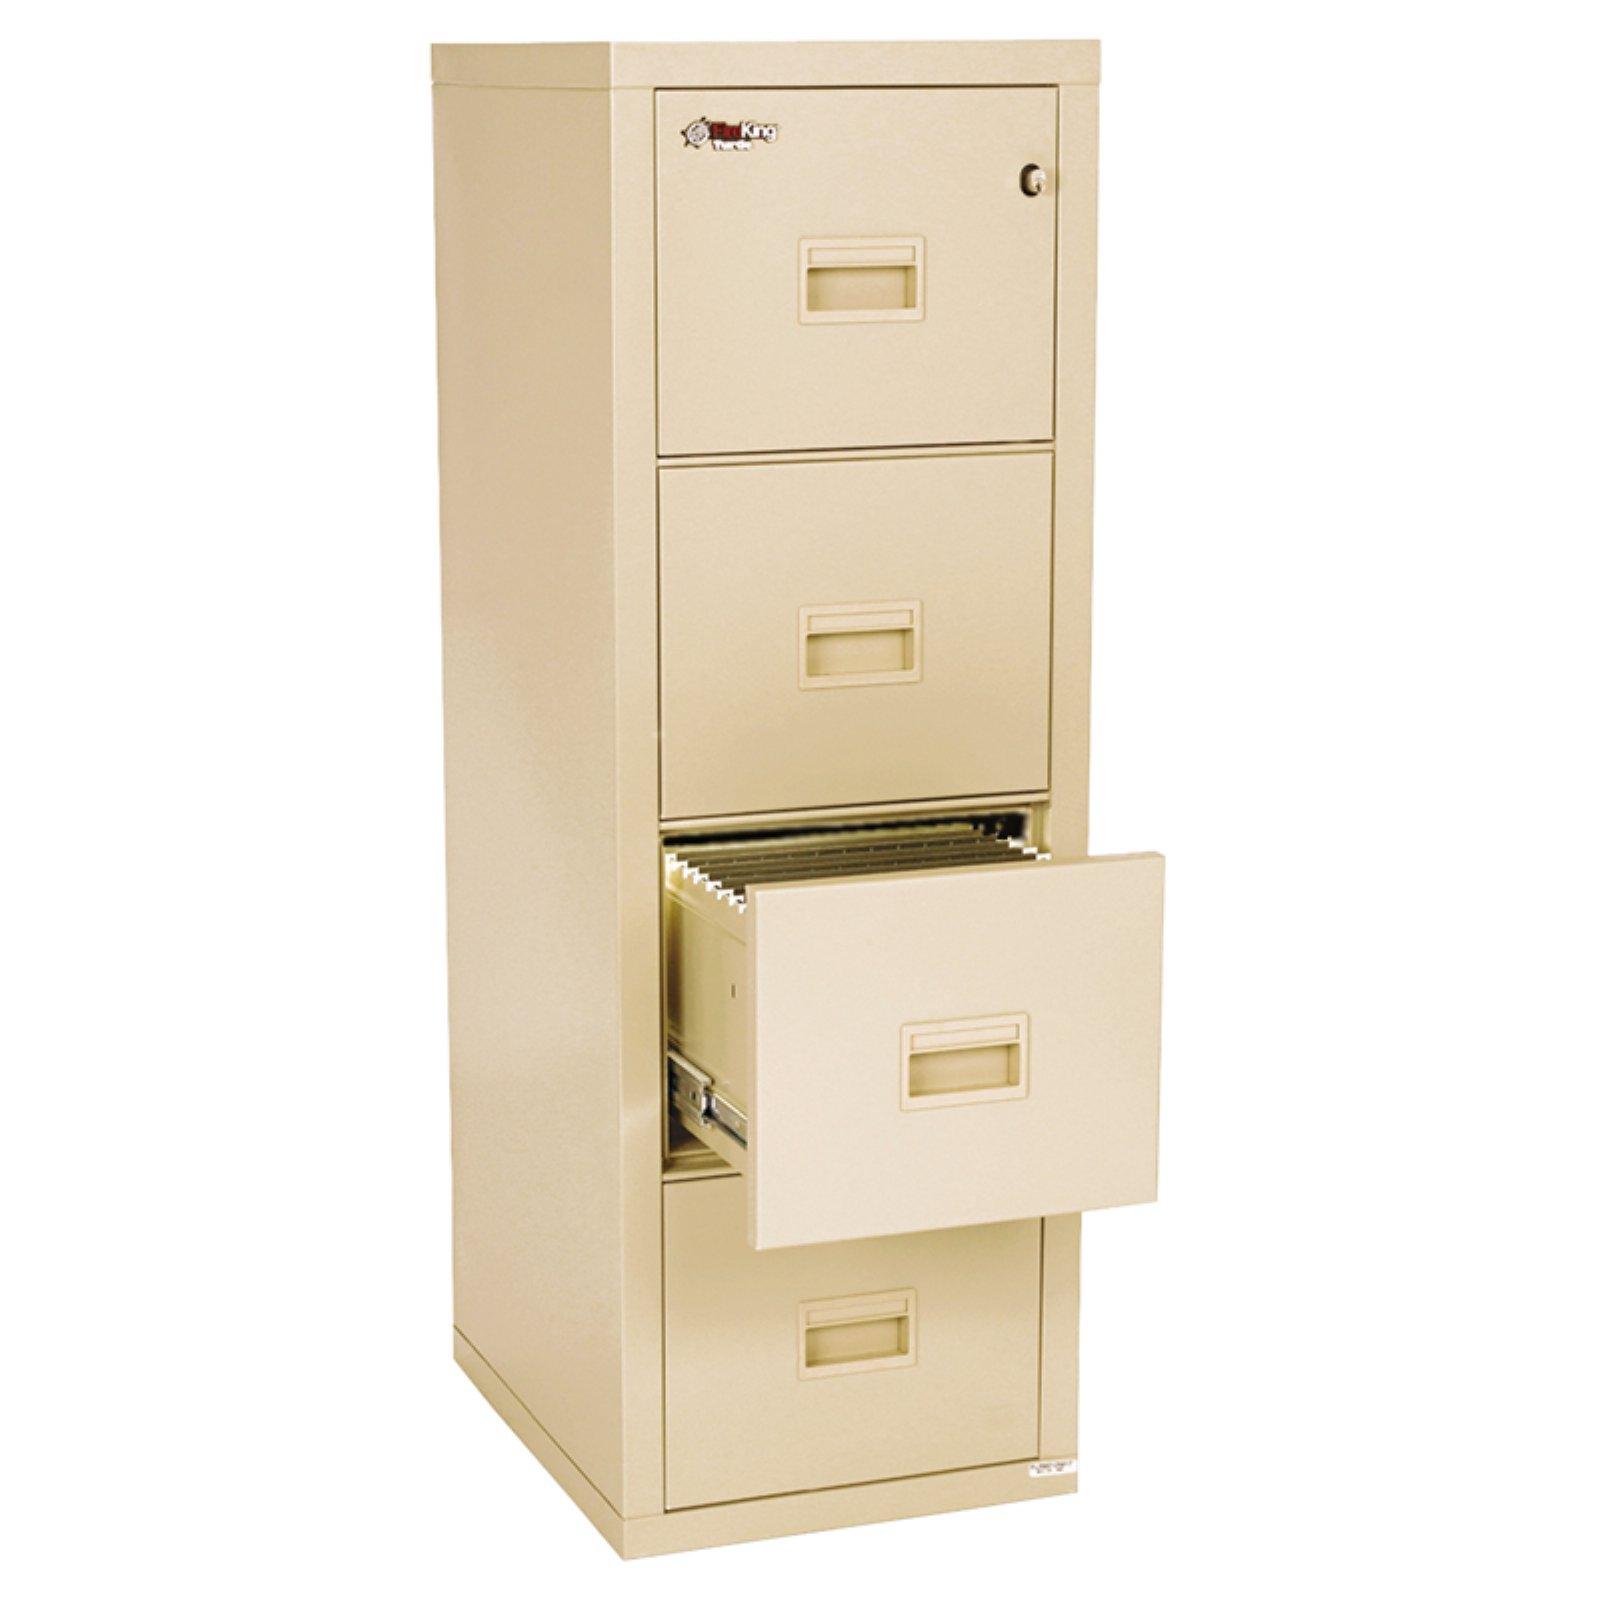 Fireking Compact Turtle 4 Drawer Vertical File Cabinet Filing